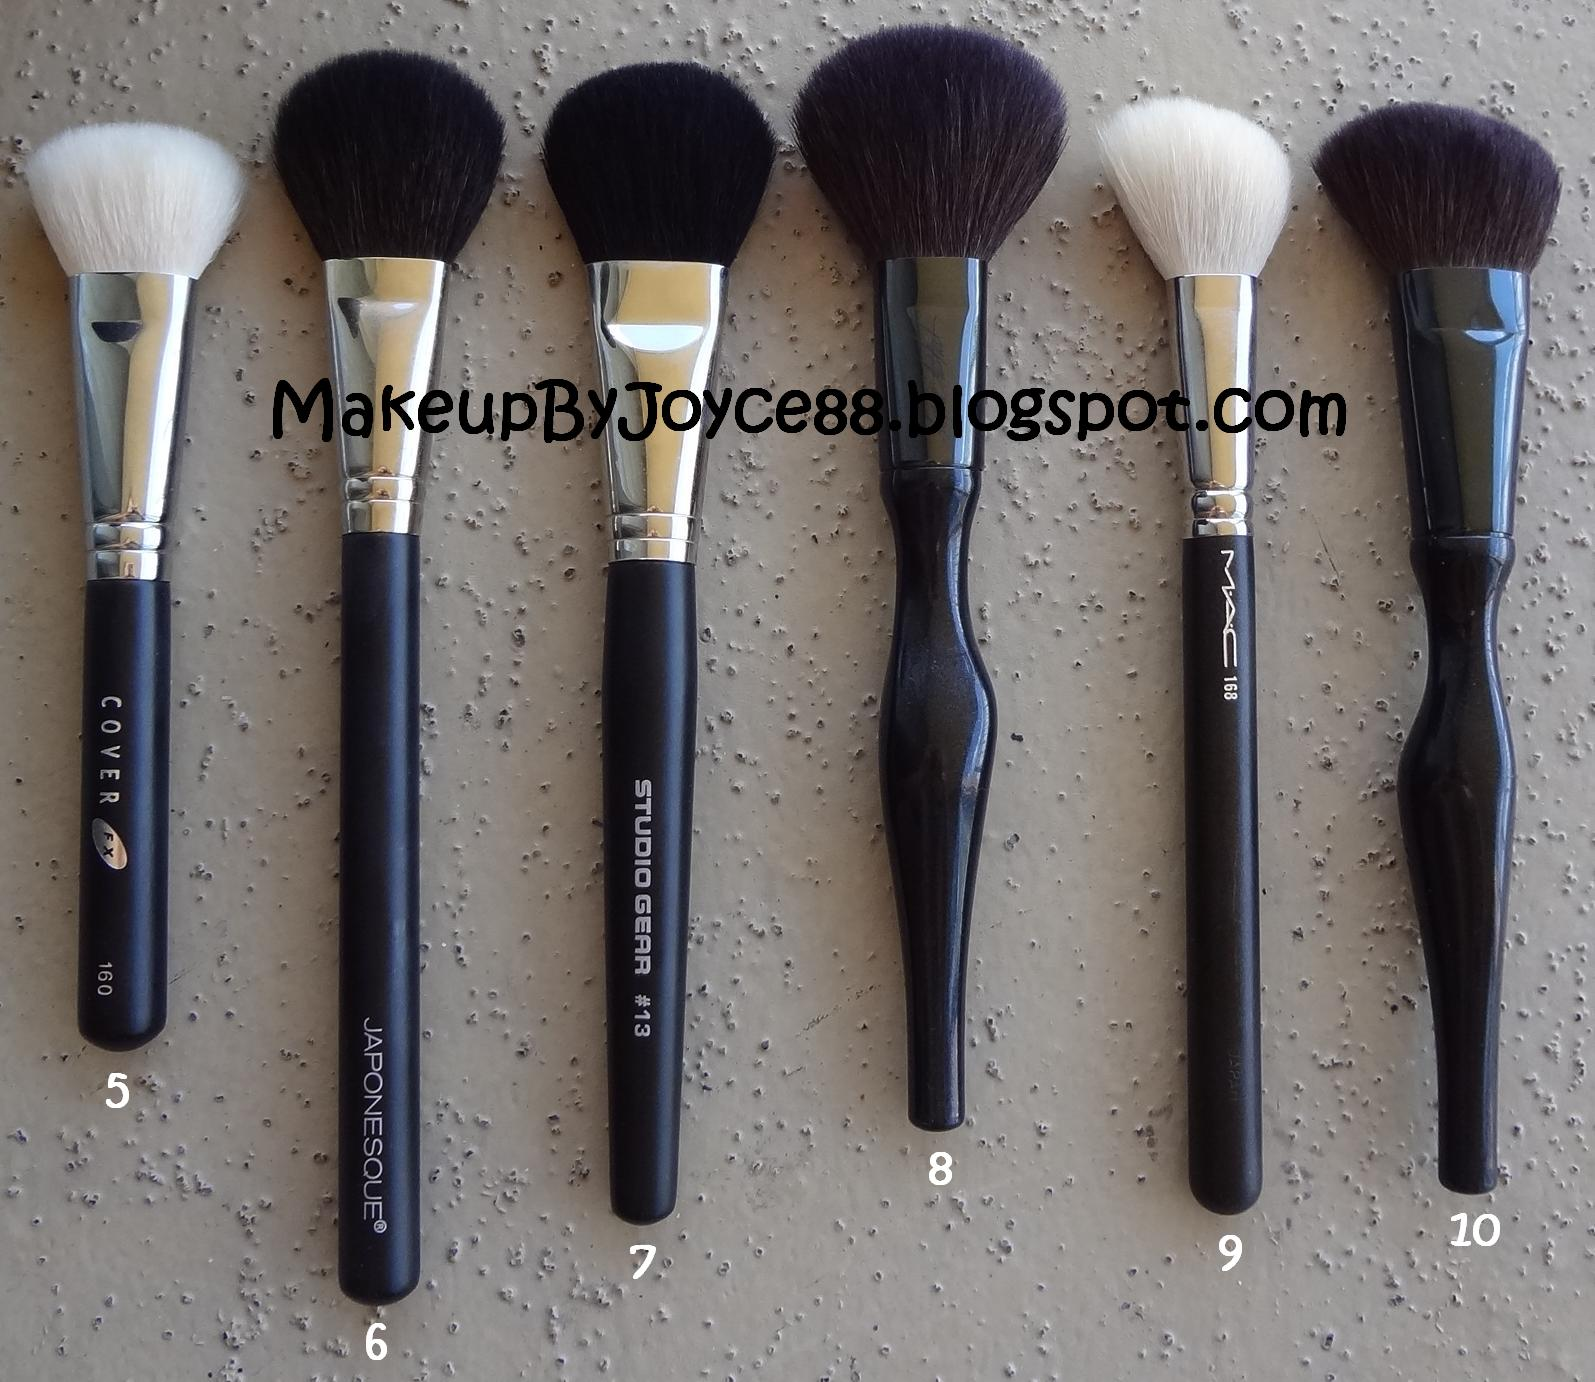 mac liquid foundation brush. wednesday, august 31, 2011 mac liquid foundation brush ,